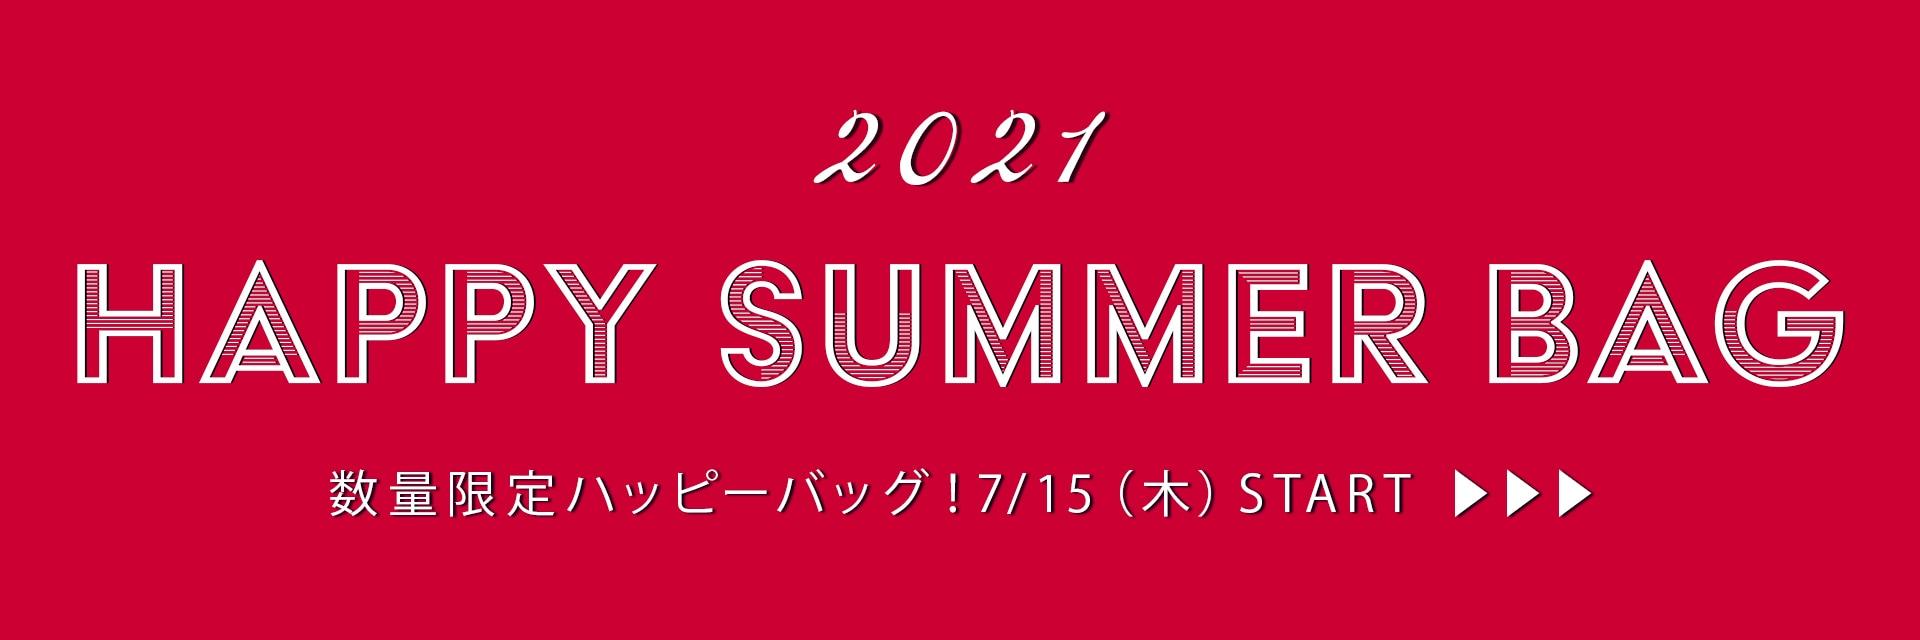 HAPPY SUMMER BAG 福袋特設ページ 2021年7月